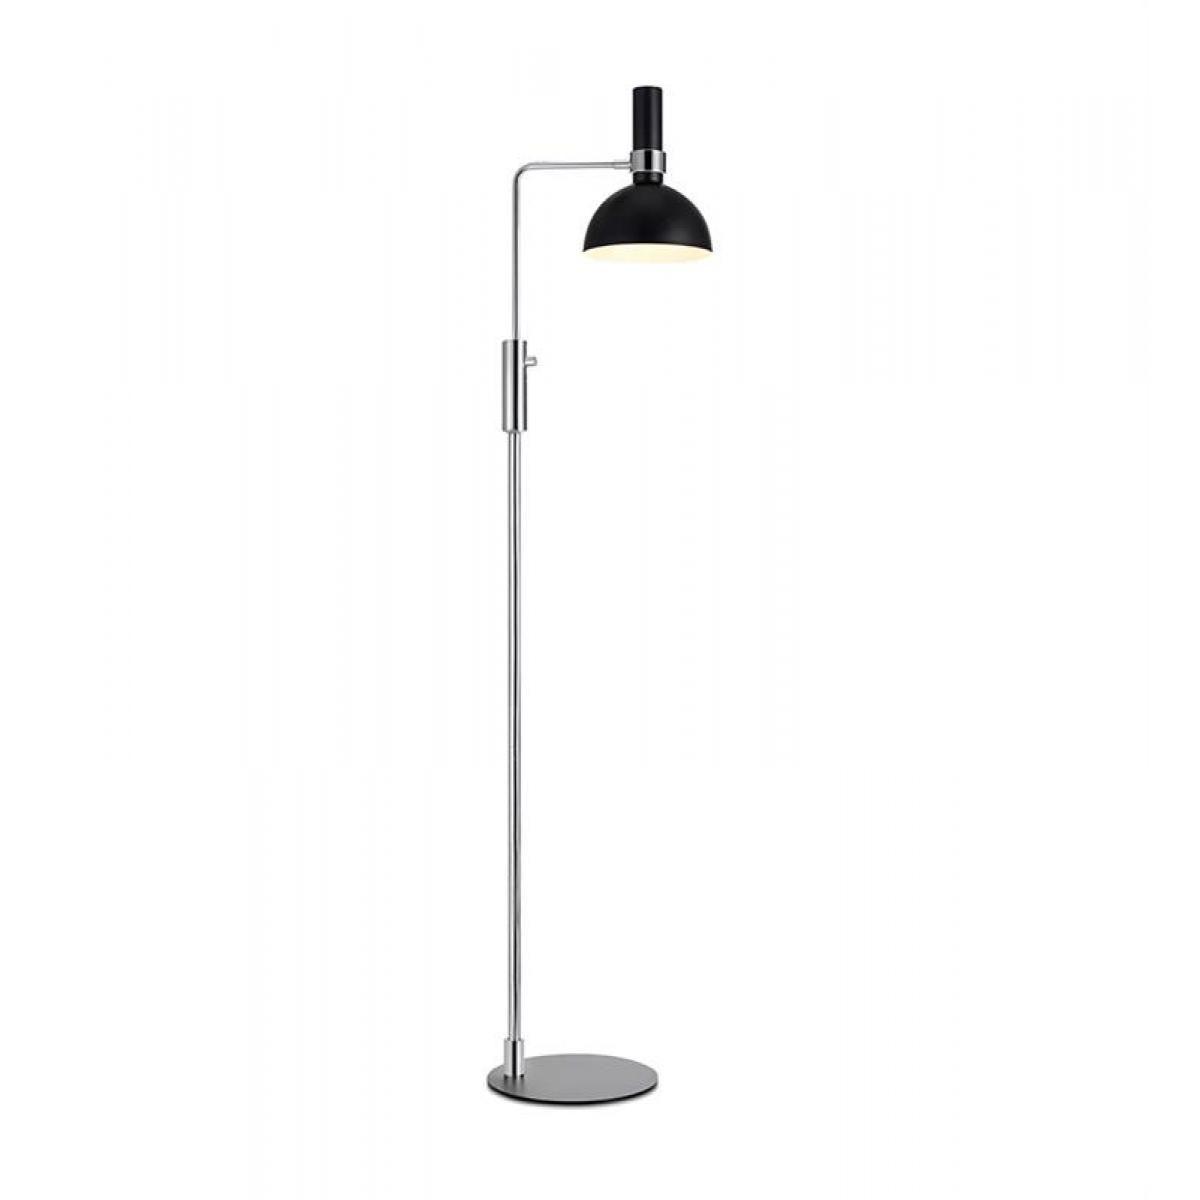 Lampa Podlogowa Markslojd Larry 1l E27 Chrom Czarny With Images Lampa Podlogowa Lampy Czarny